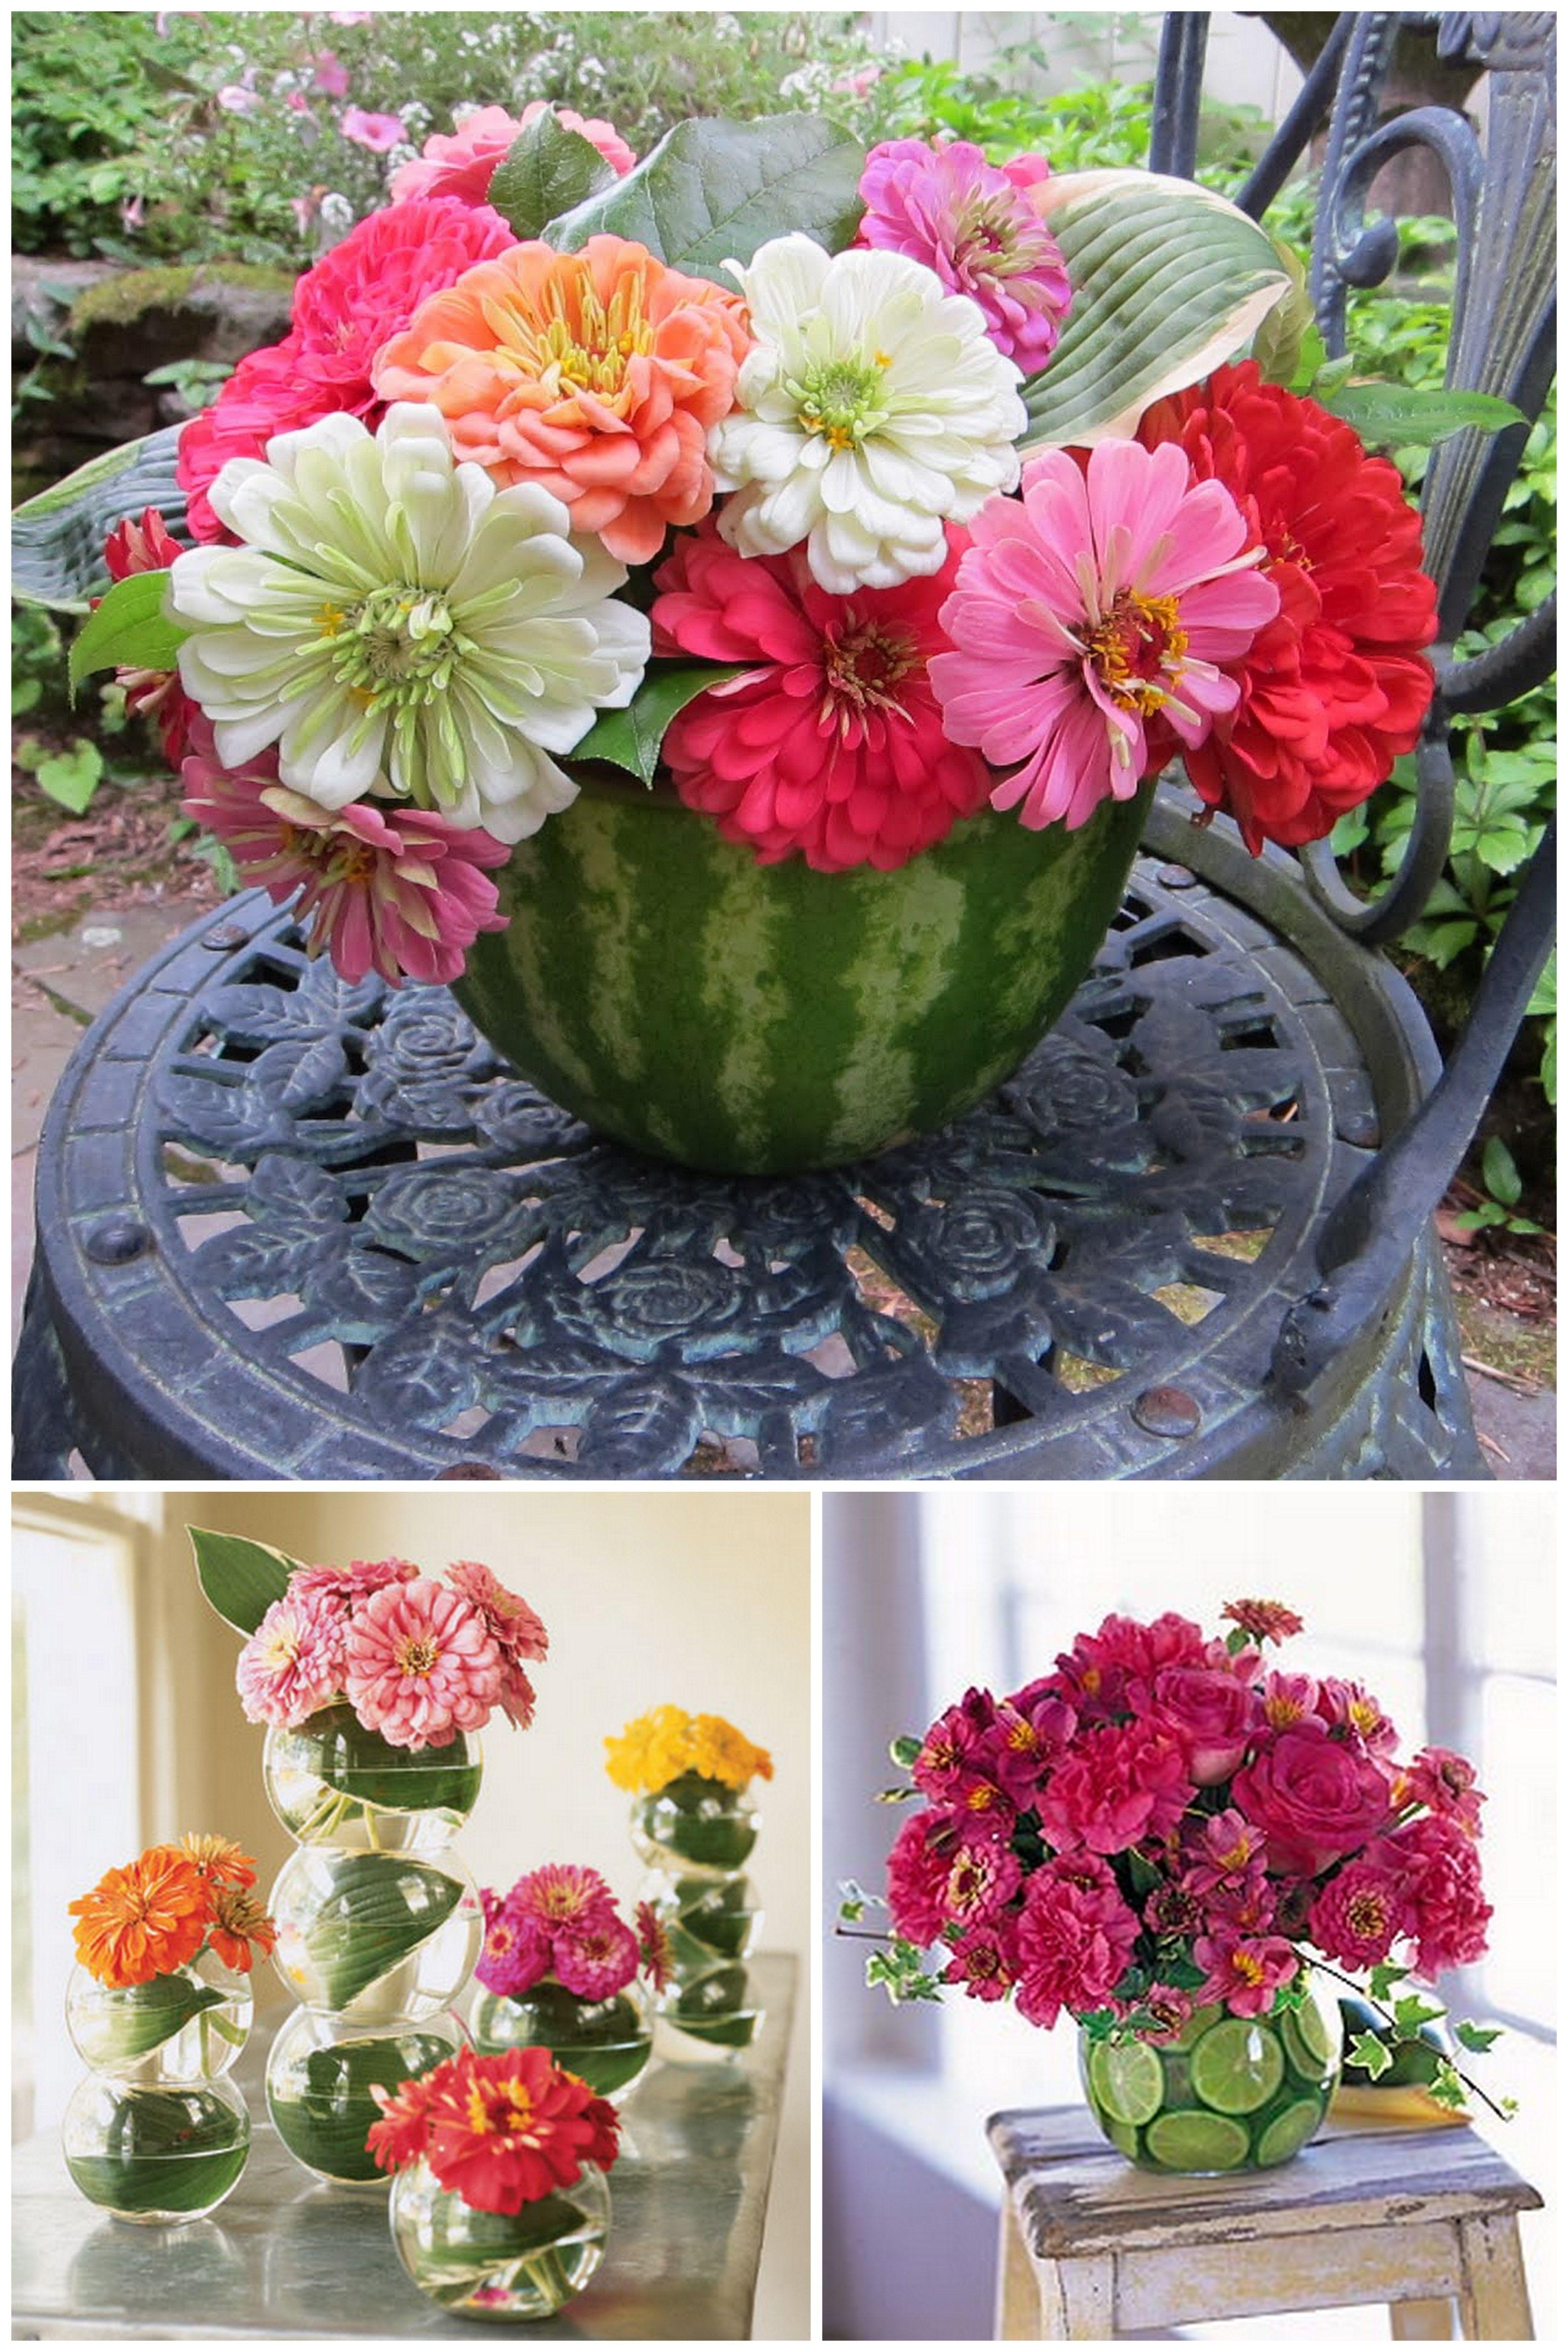 watermelon vase love it great for an outdoor summer centerpiece rh pinterest com